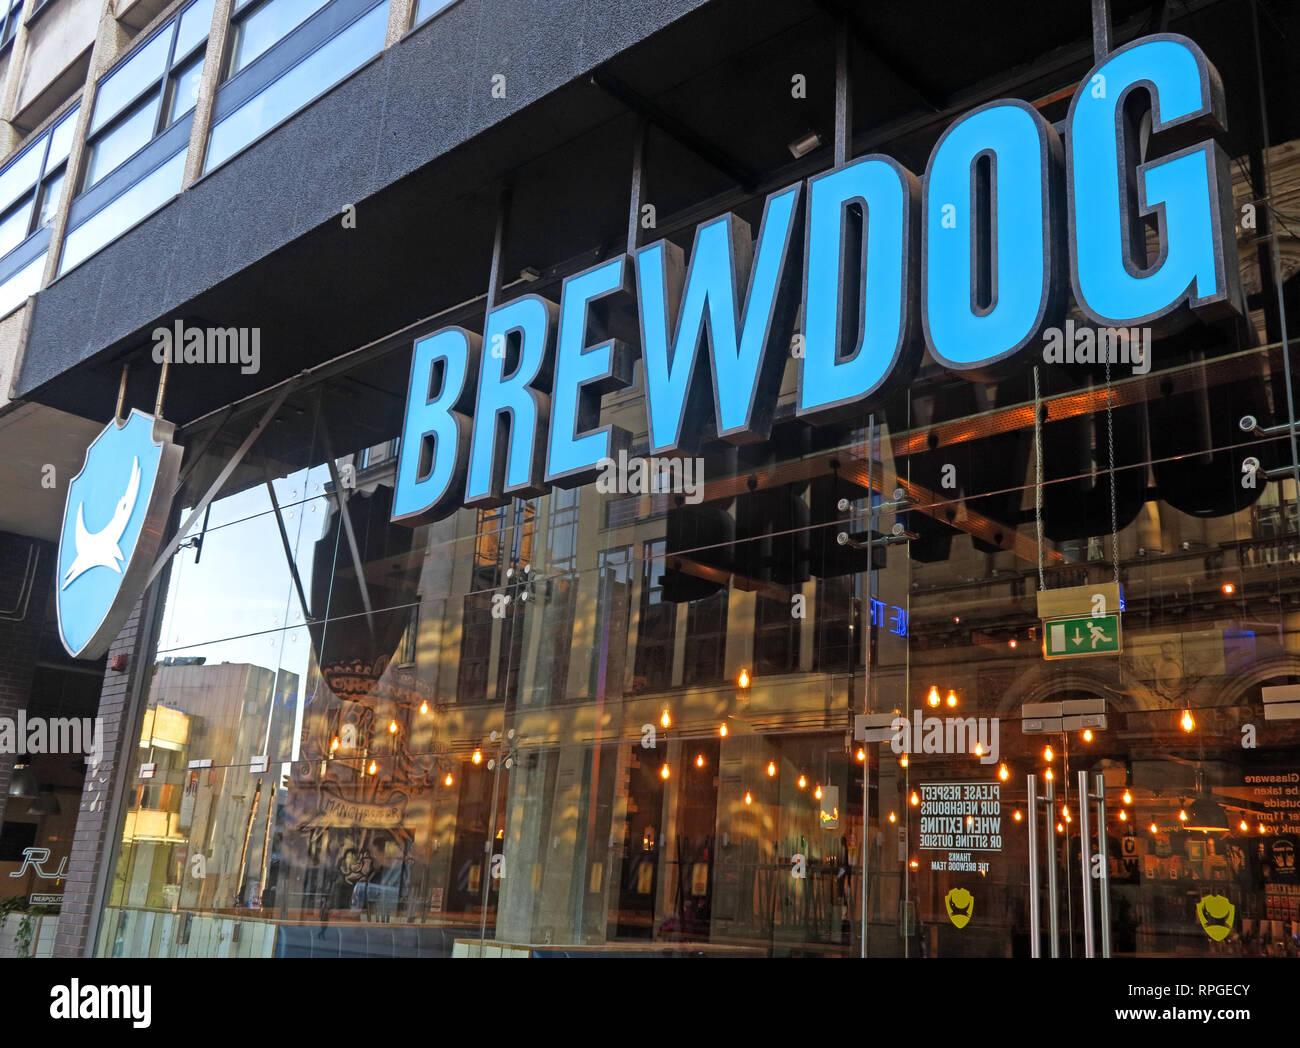 Brewdog Manchester bar, Scottish Mutual House, 35 Peter St, Manchester, England, UK,  M2 5BG - Stock Image